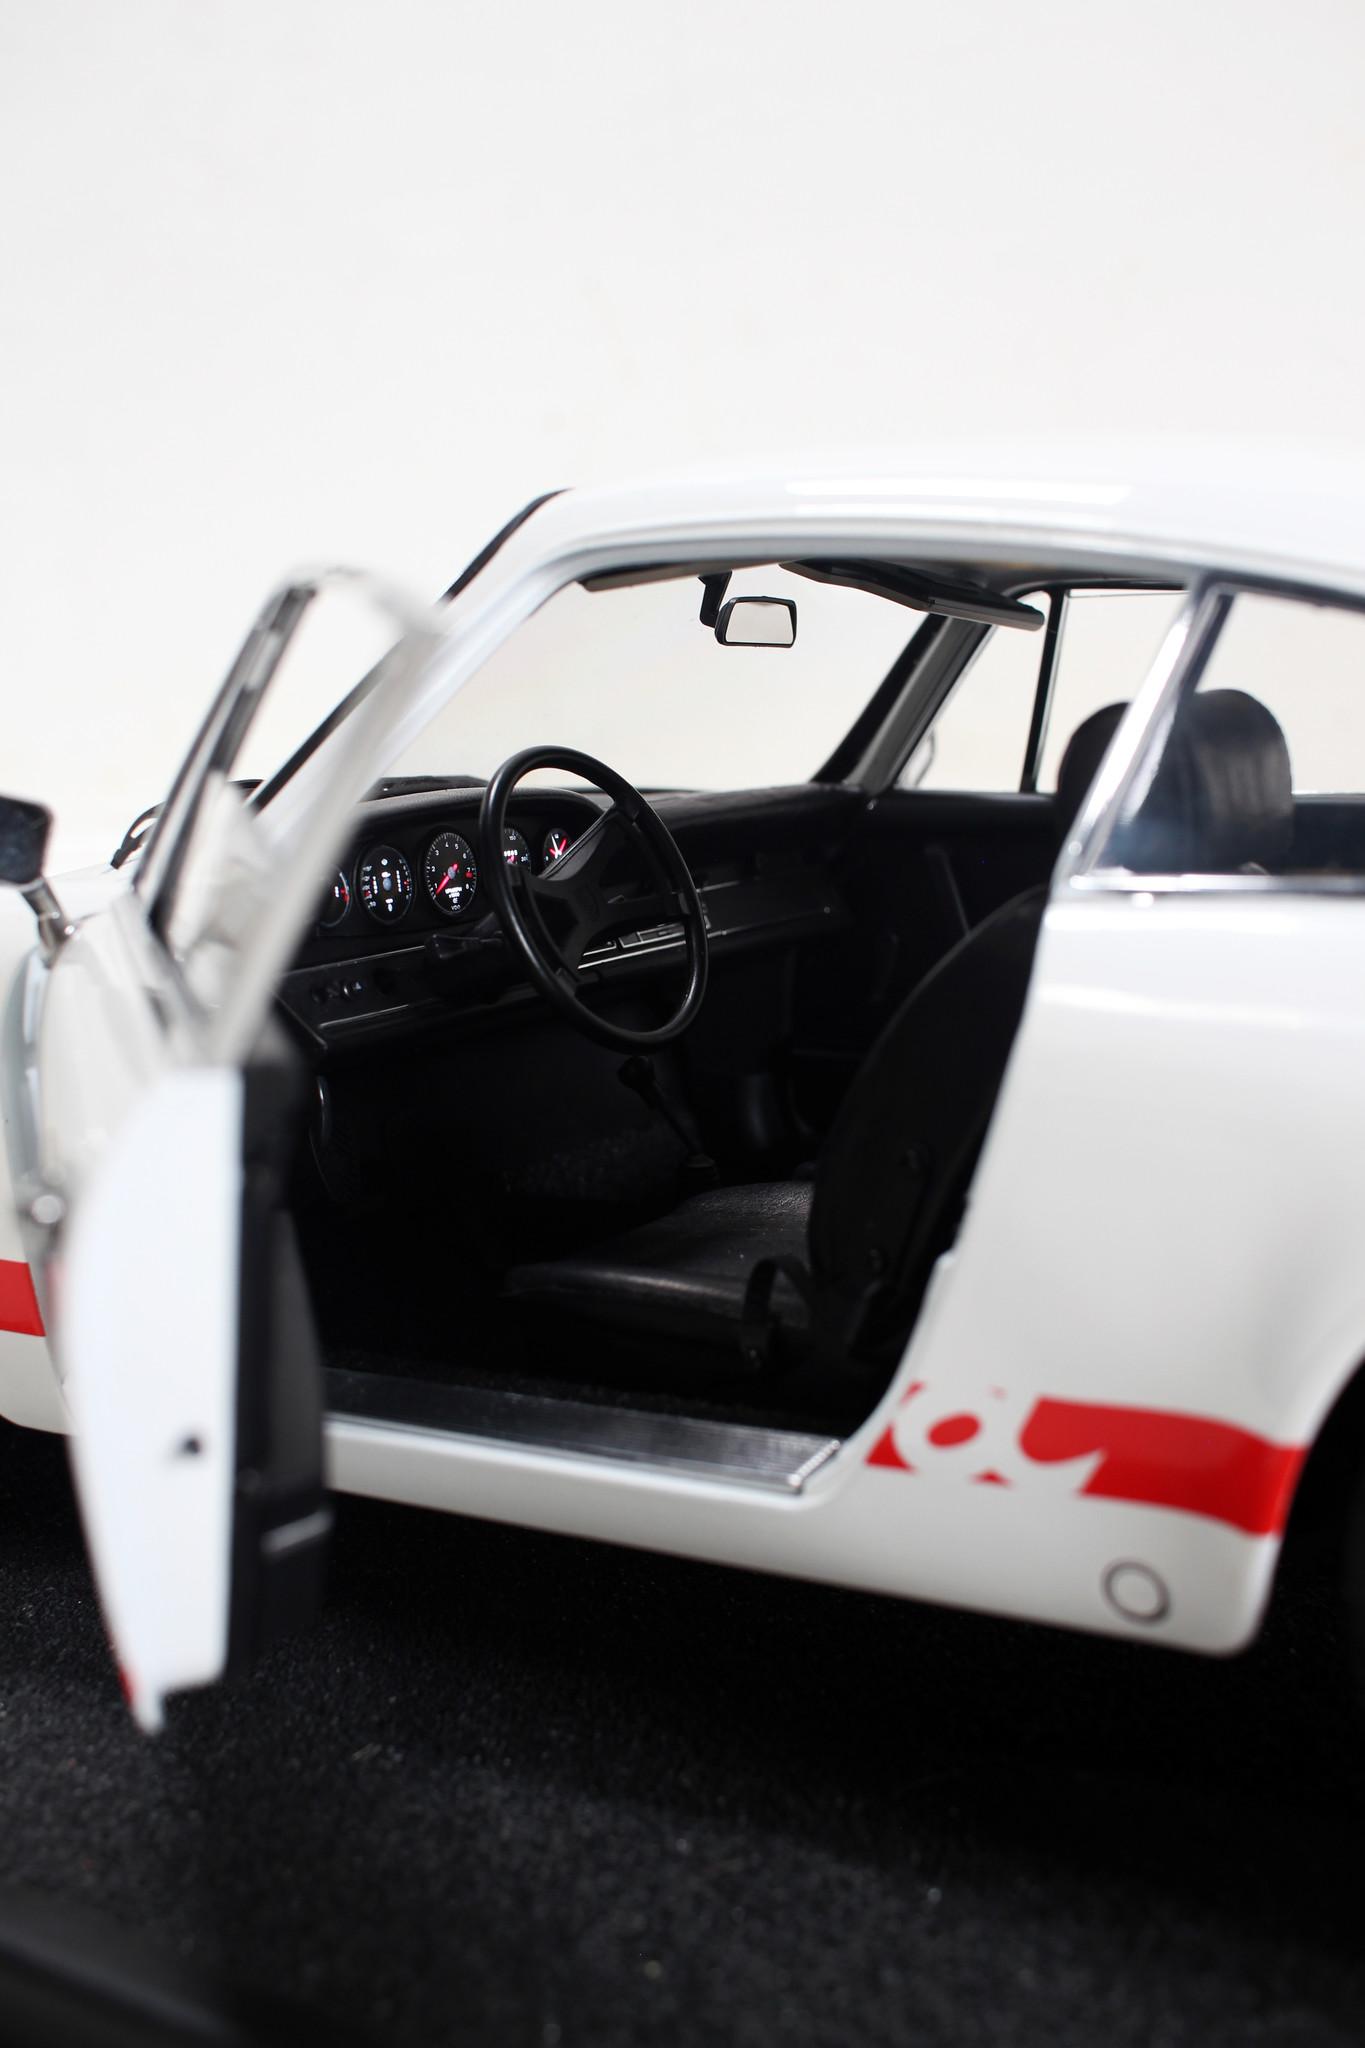 Porsche RS 2.7 scale model 1: 8